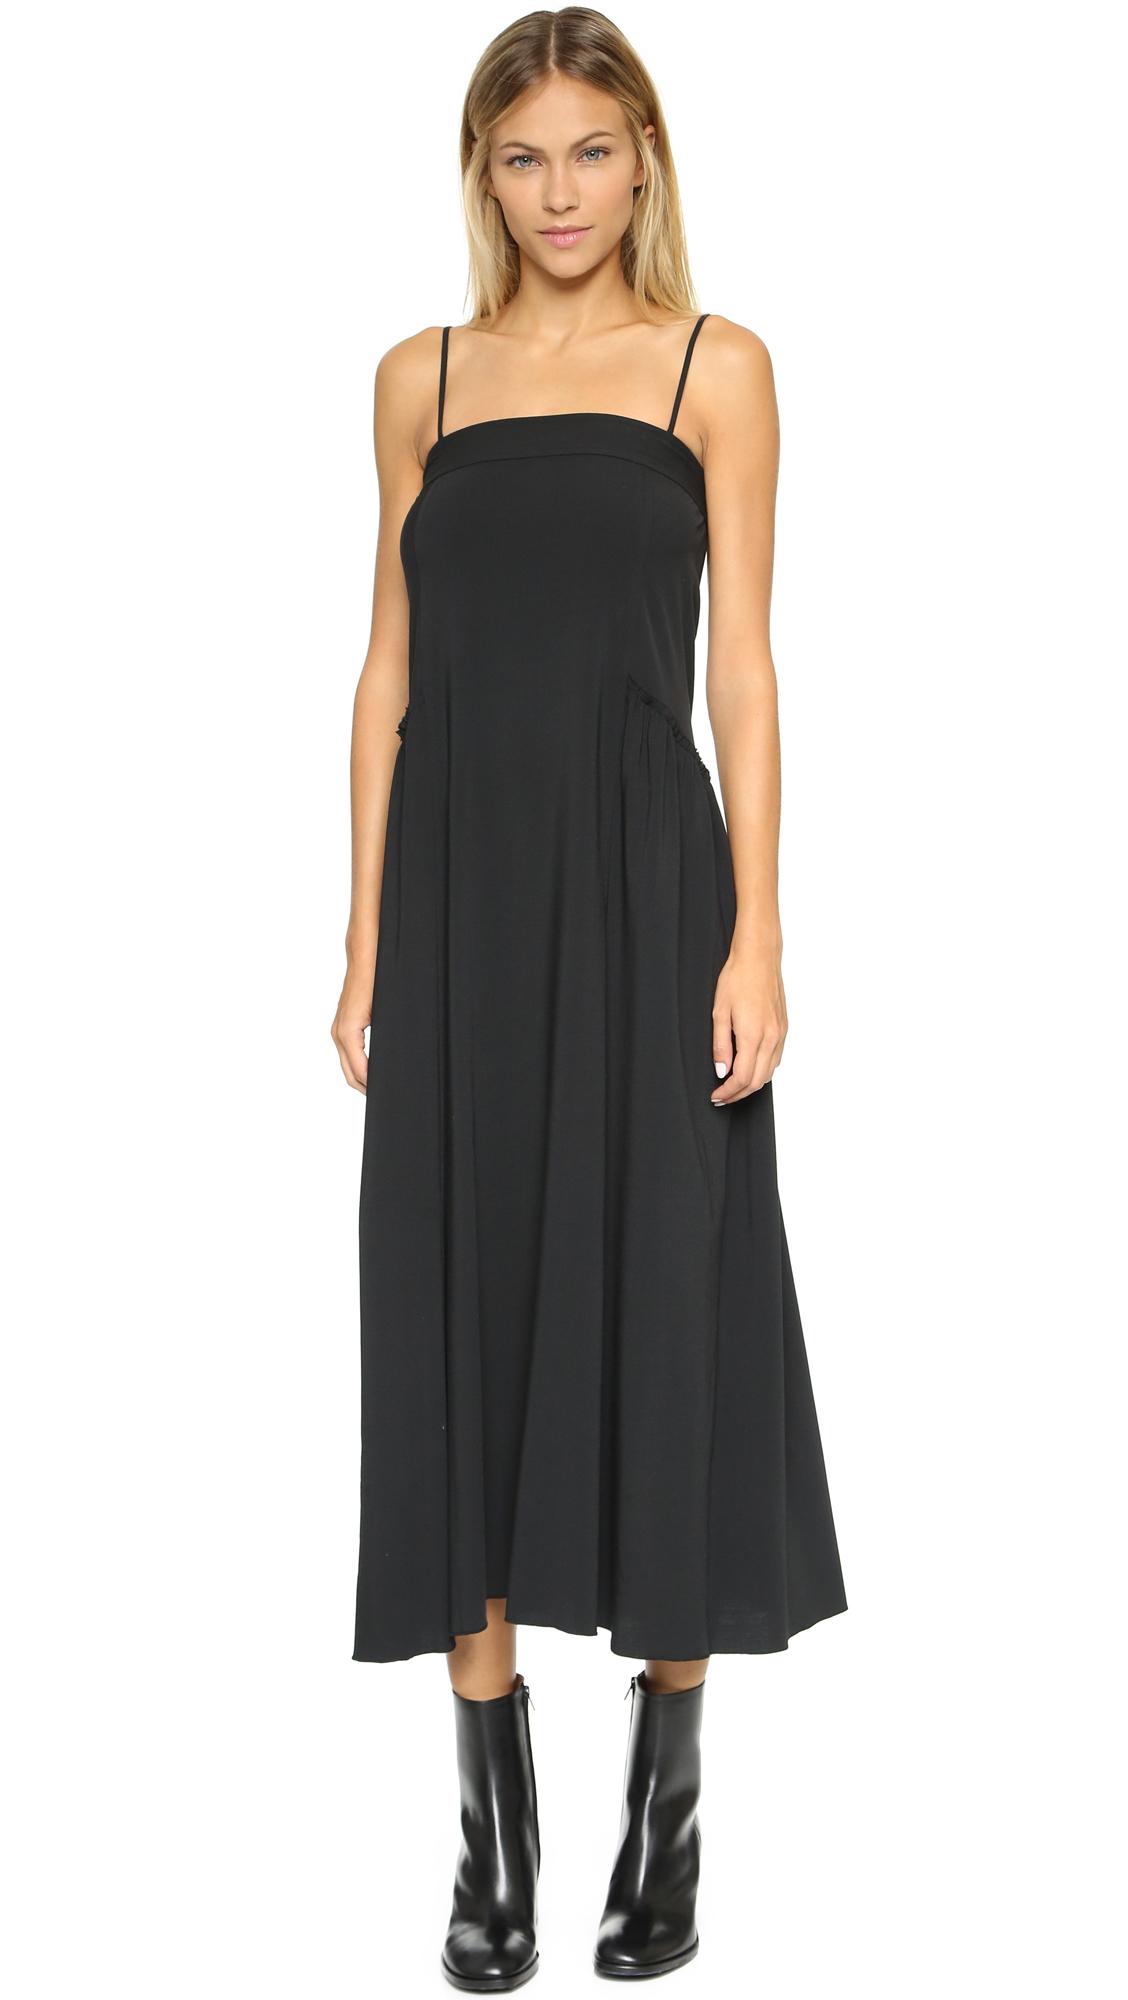 Black strap maxi dress